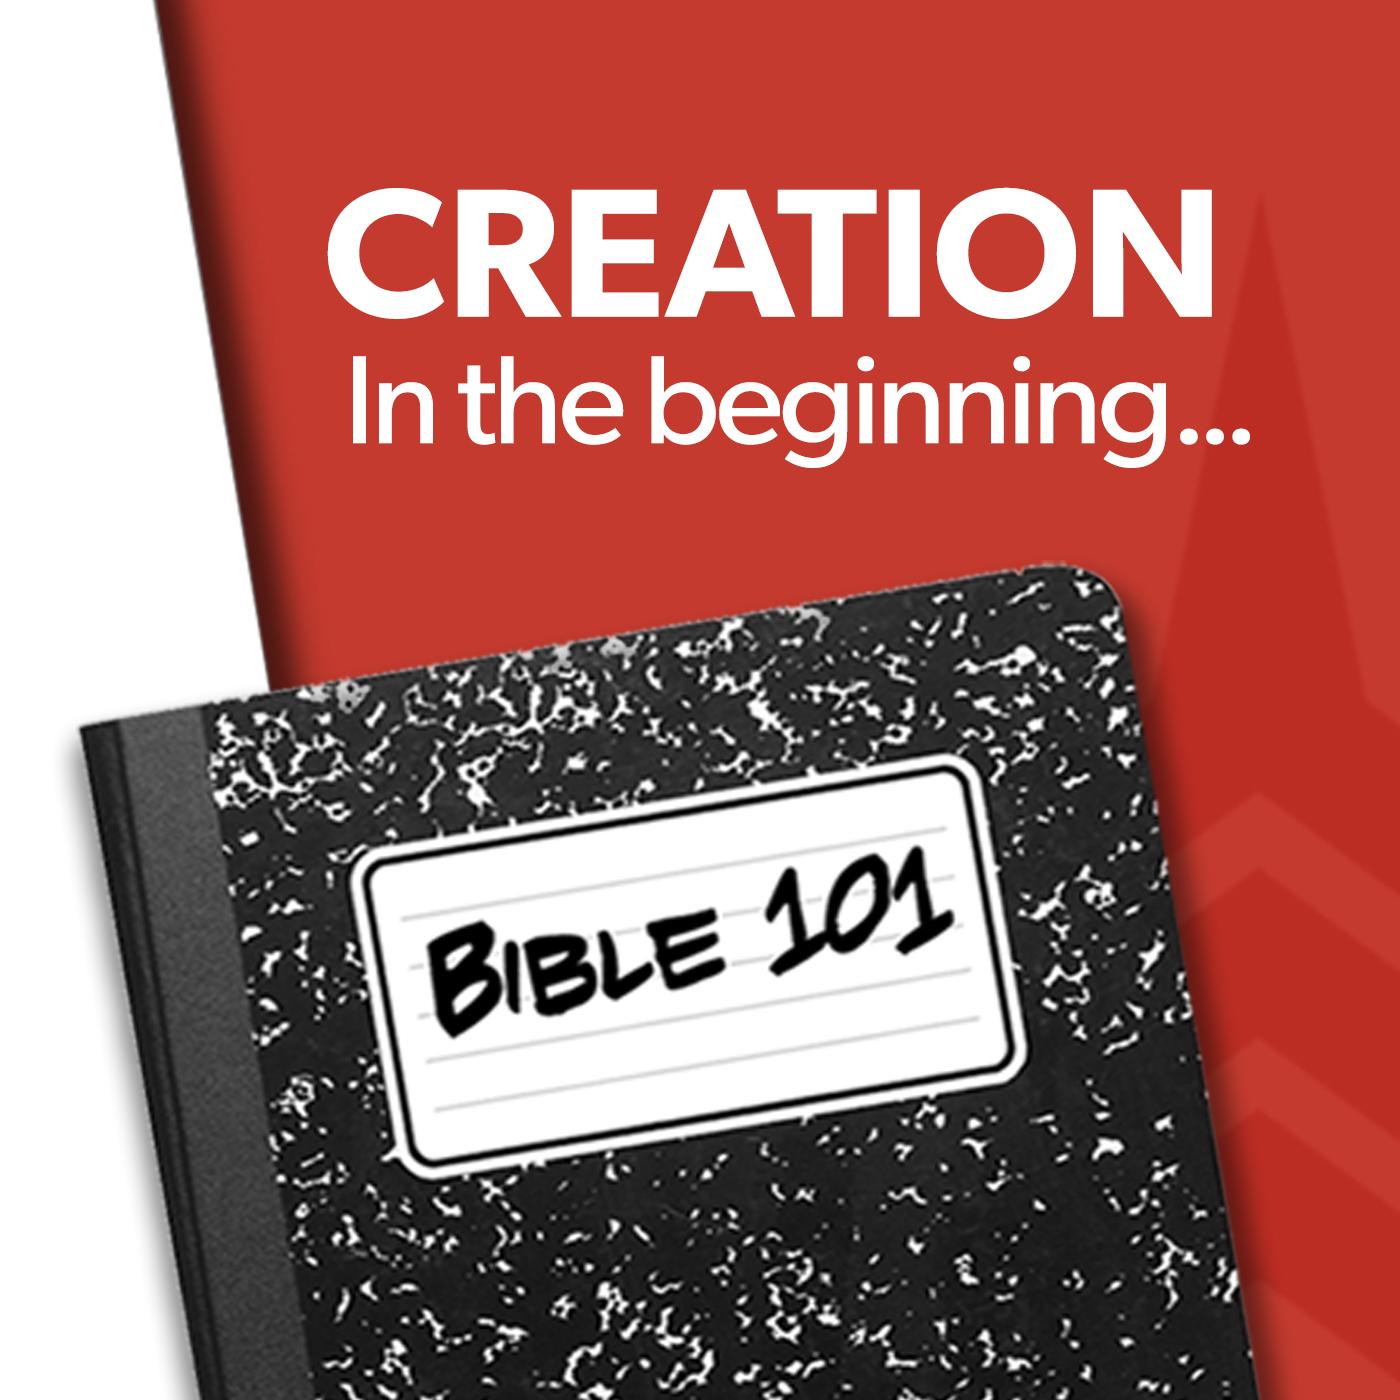 101 Creation.jpg